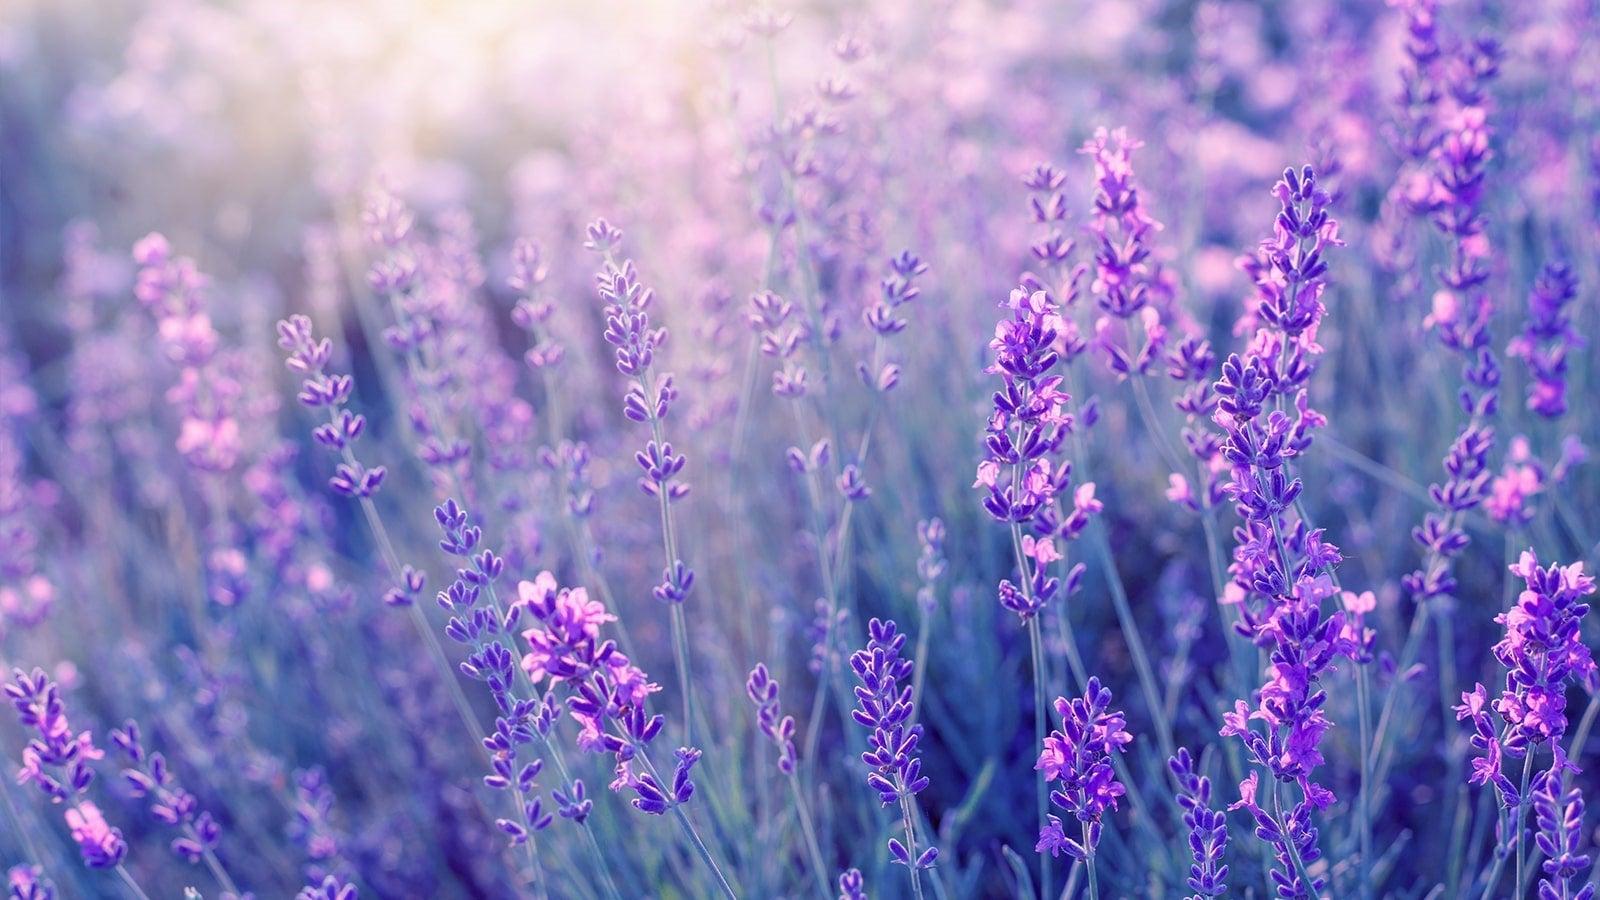 Lavender field in the sunshine